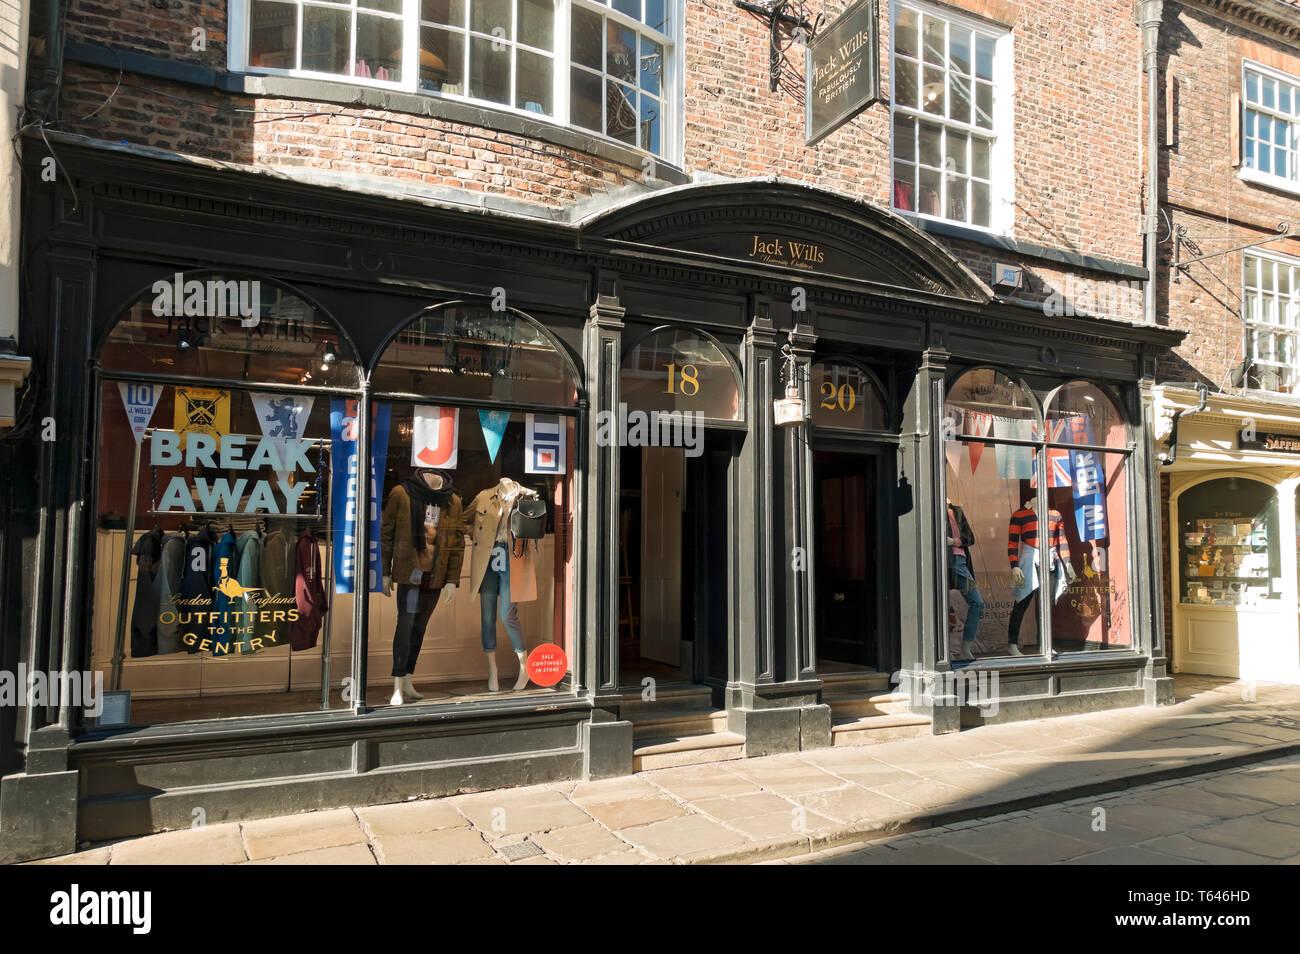 Jack Wills clothing shop store Stonegate York North Yorkshire England UK United Kingdom GB Great Britain Stock Photo